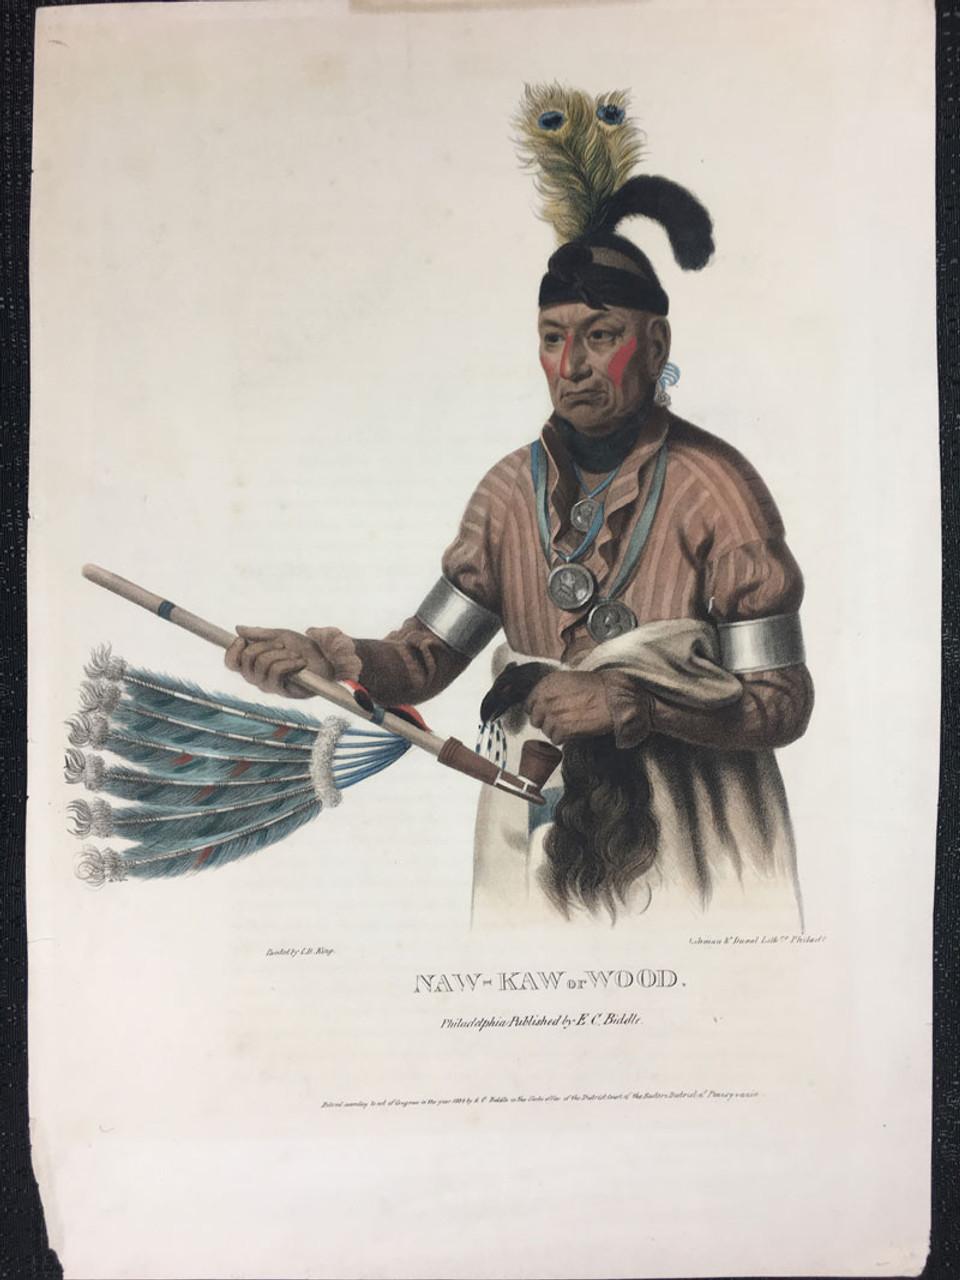 McKenny & Hall NAW-KAW or WOOD